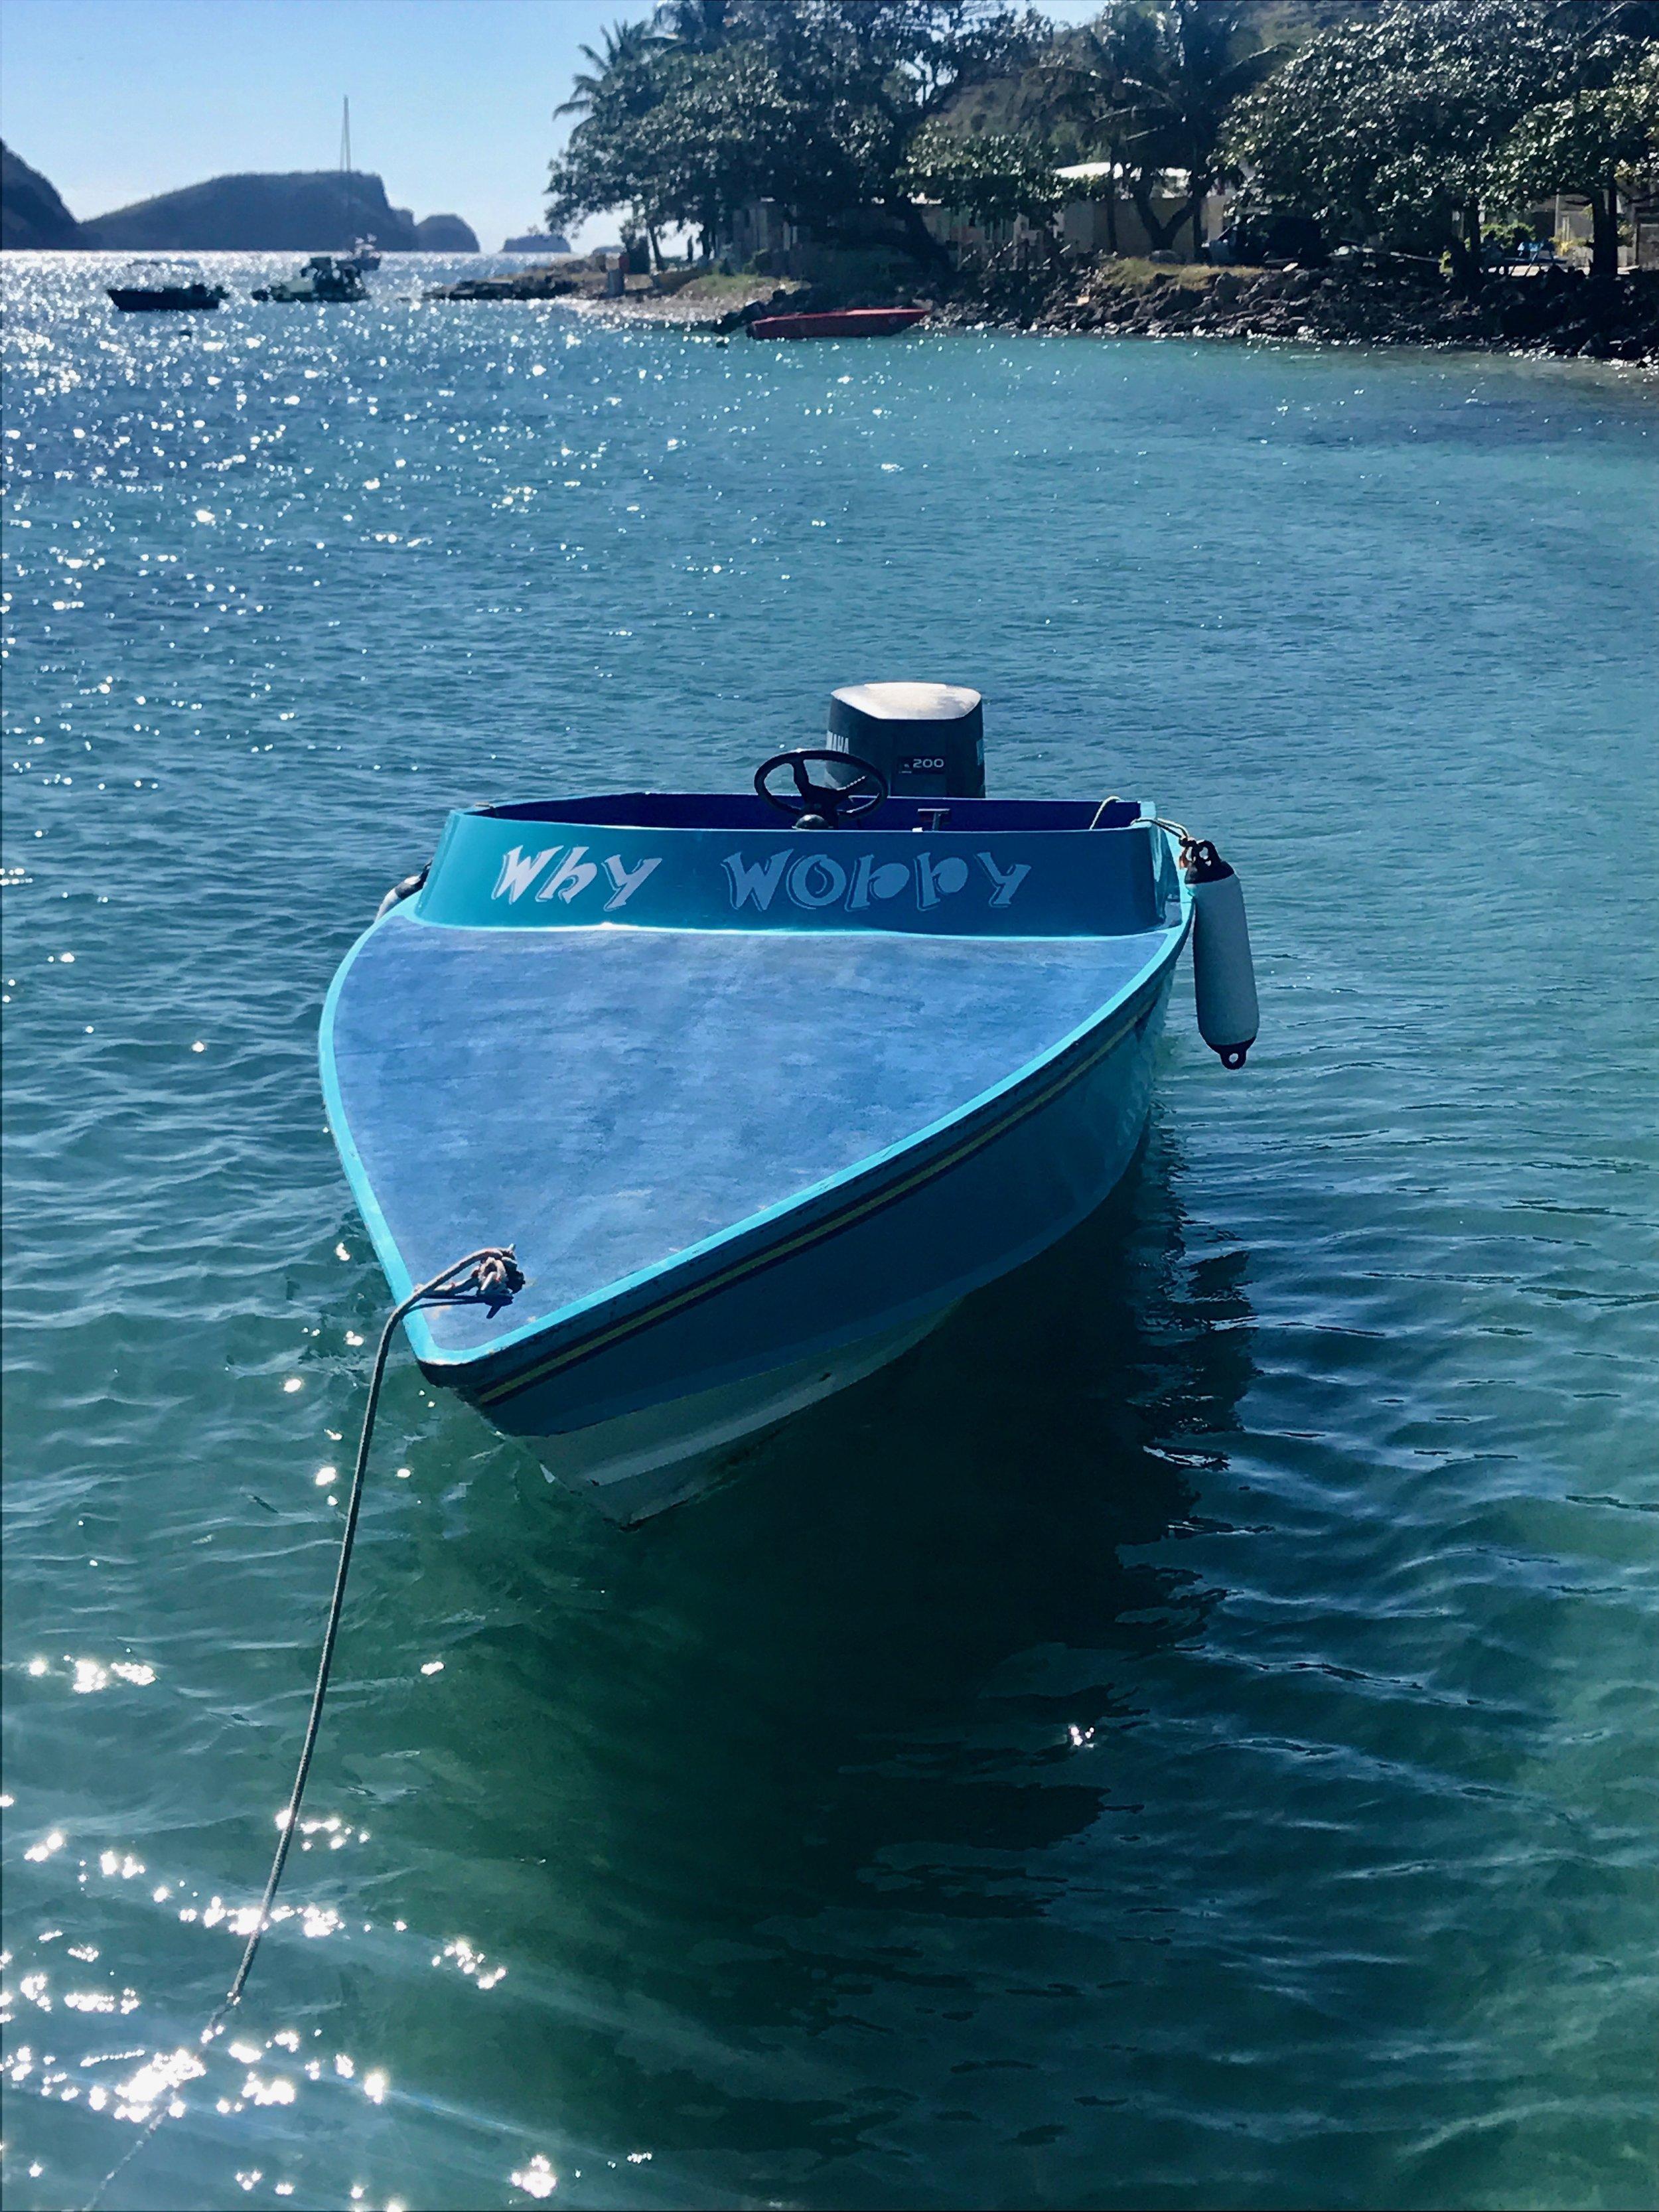 Favorite color, favorite boat name